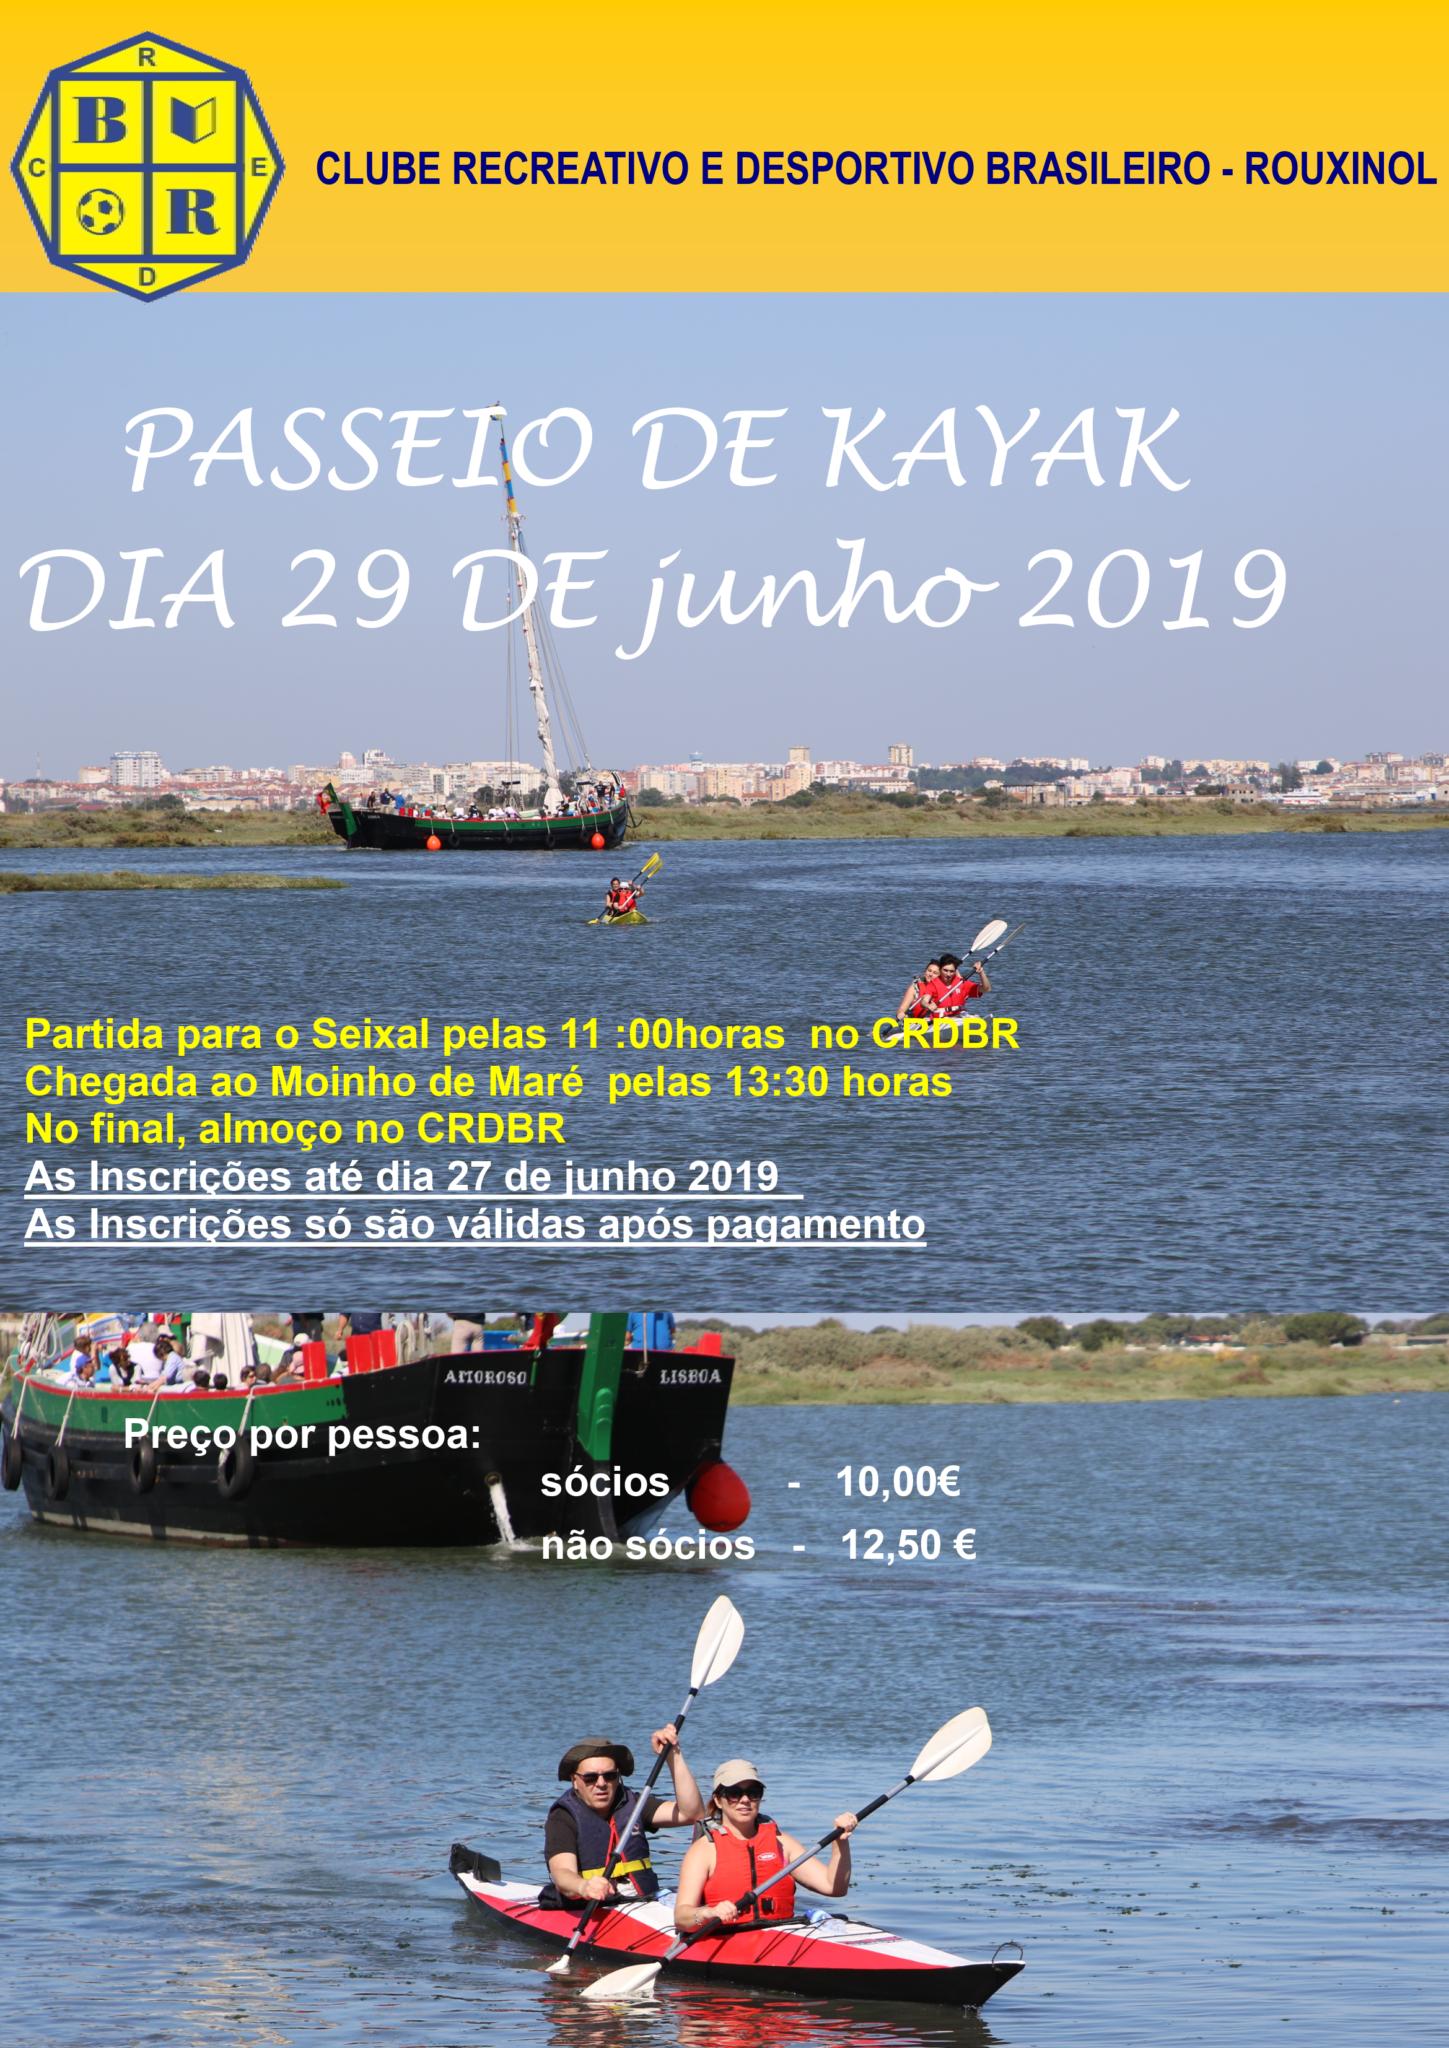 Passeio Kayak dia 29 de junho 2019…participa!